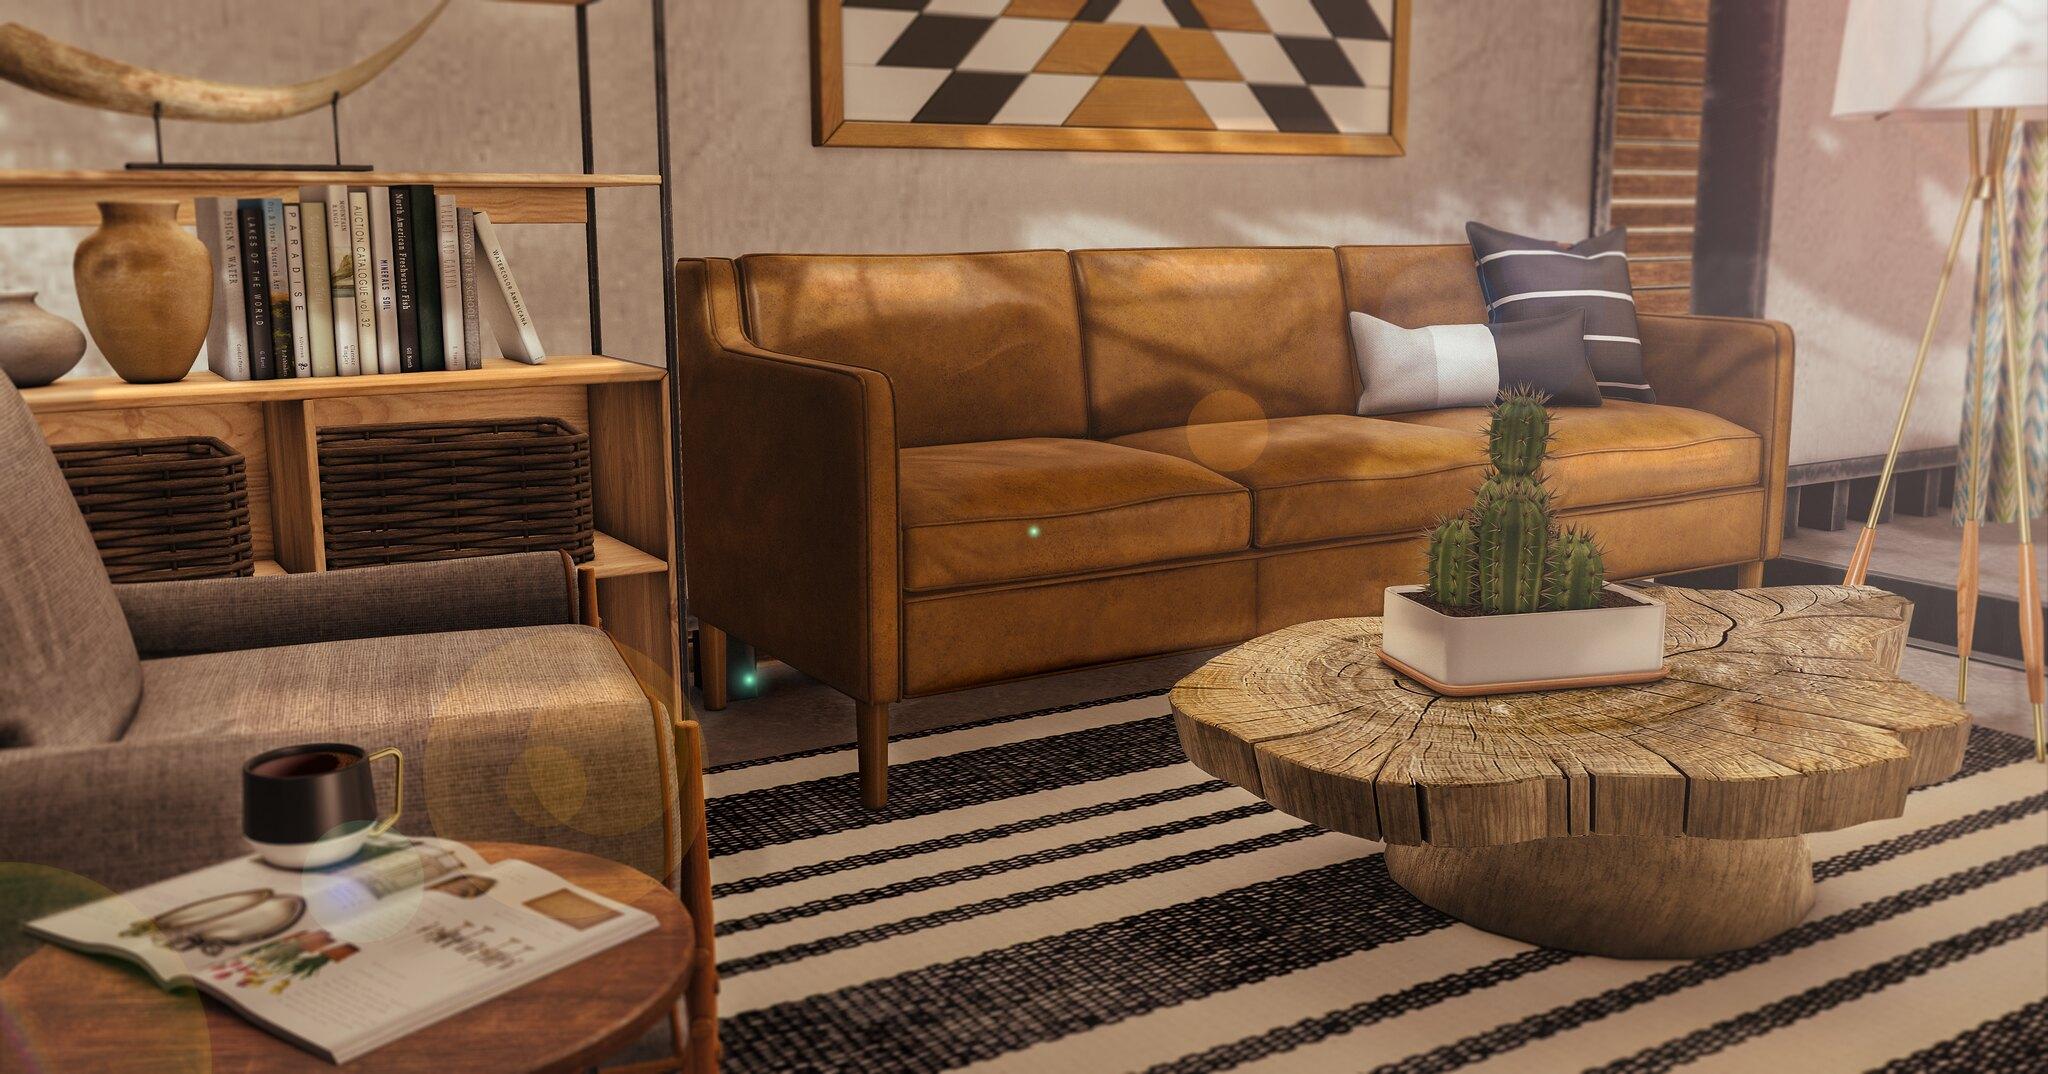 Glamorous Furniture//Indigo by Fancy Decor